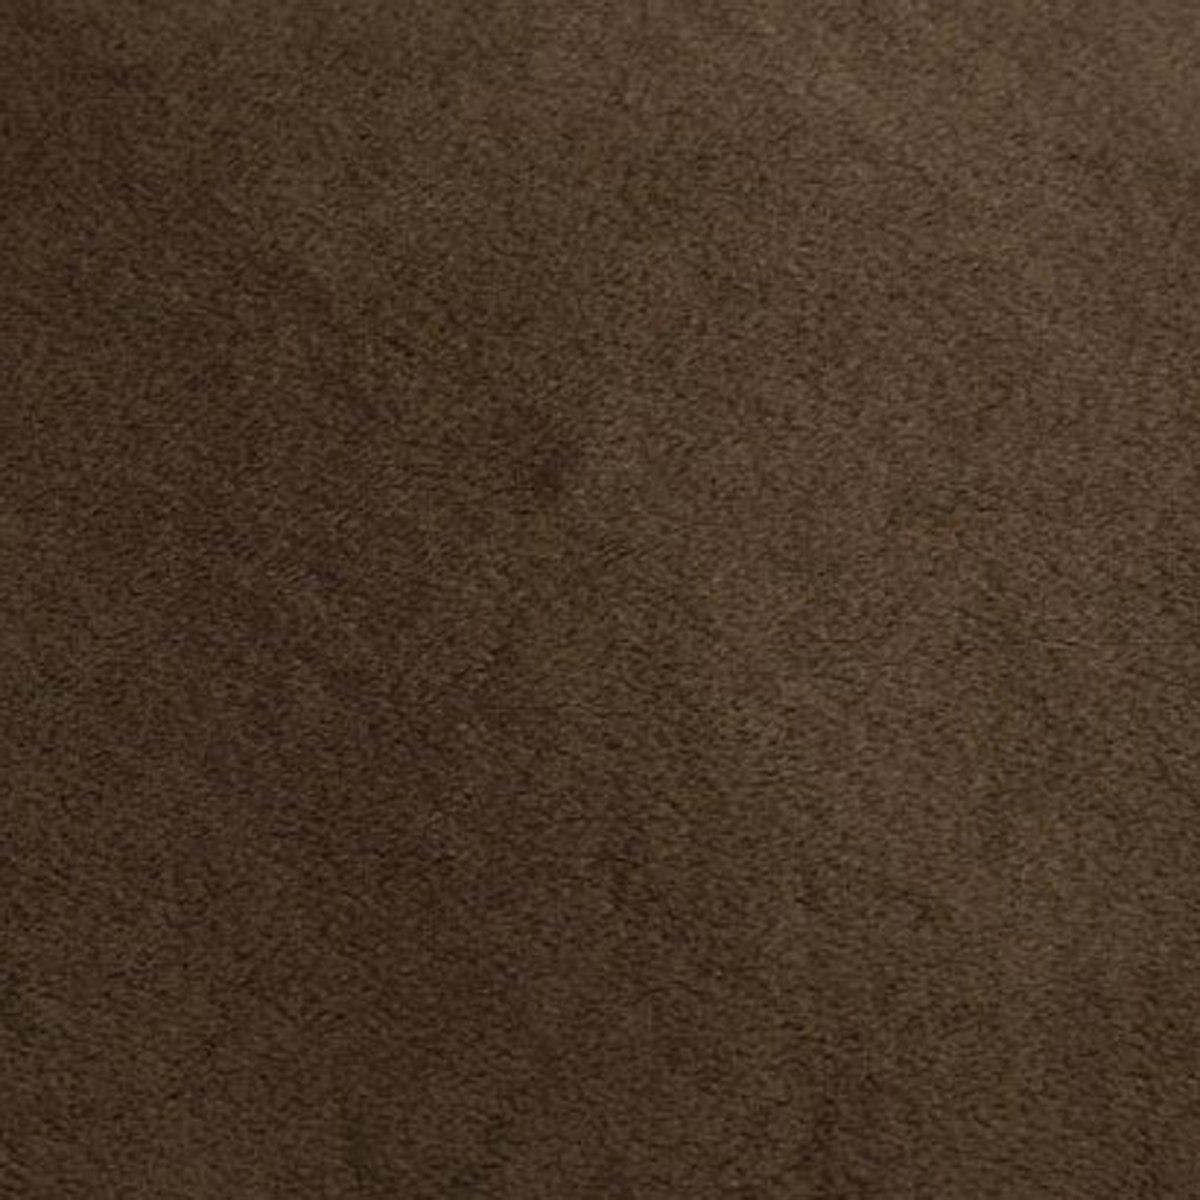 Cuddle 3 - 90in - brown - C3-90-brown